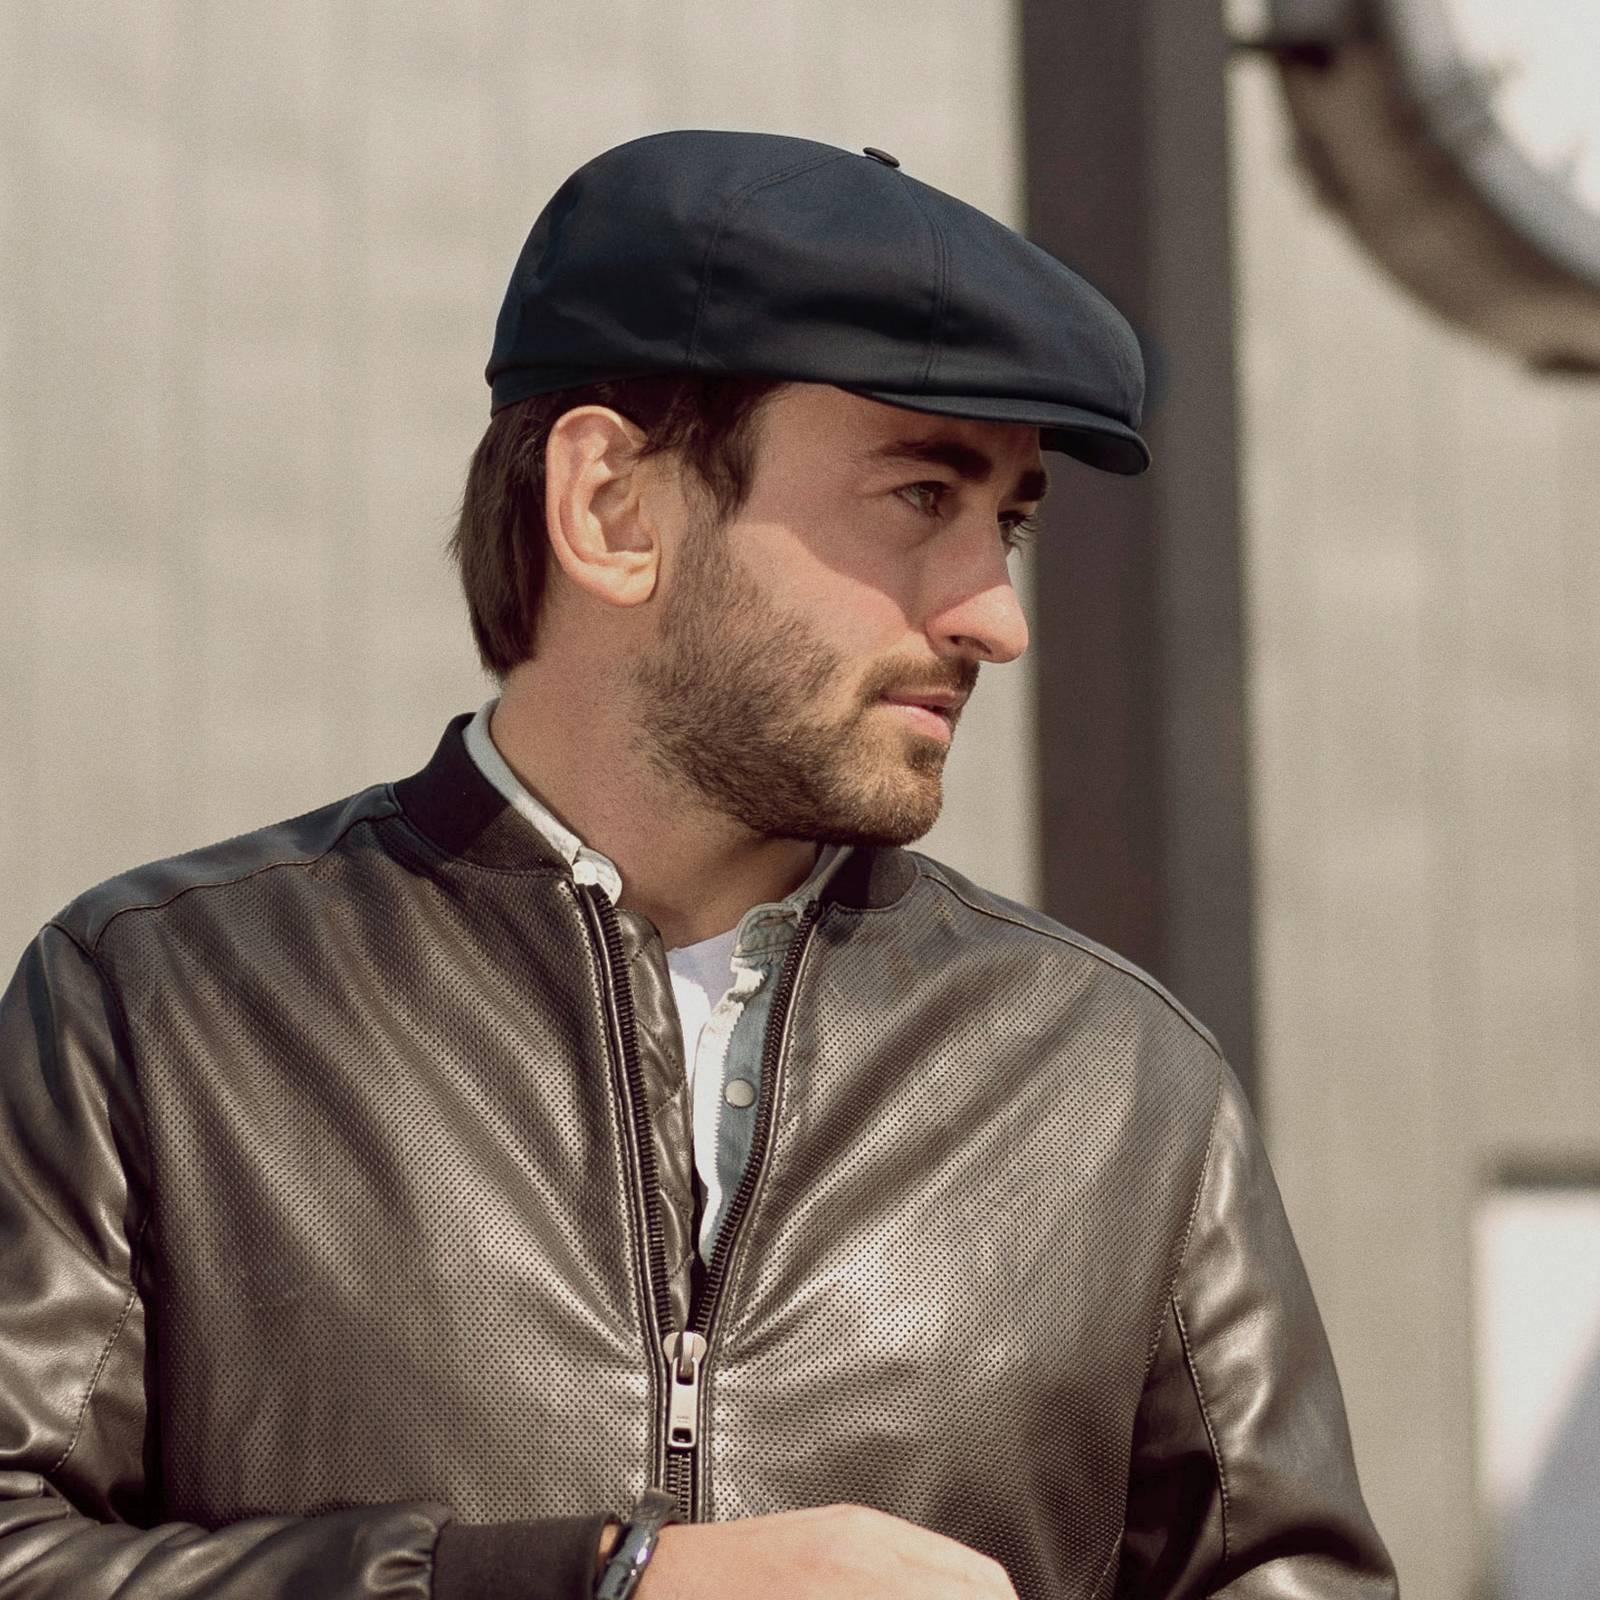 Shelby - Mütze Peaky Blinders, schwarz mütze, dunkelblau männer mütze